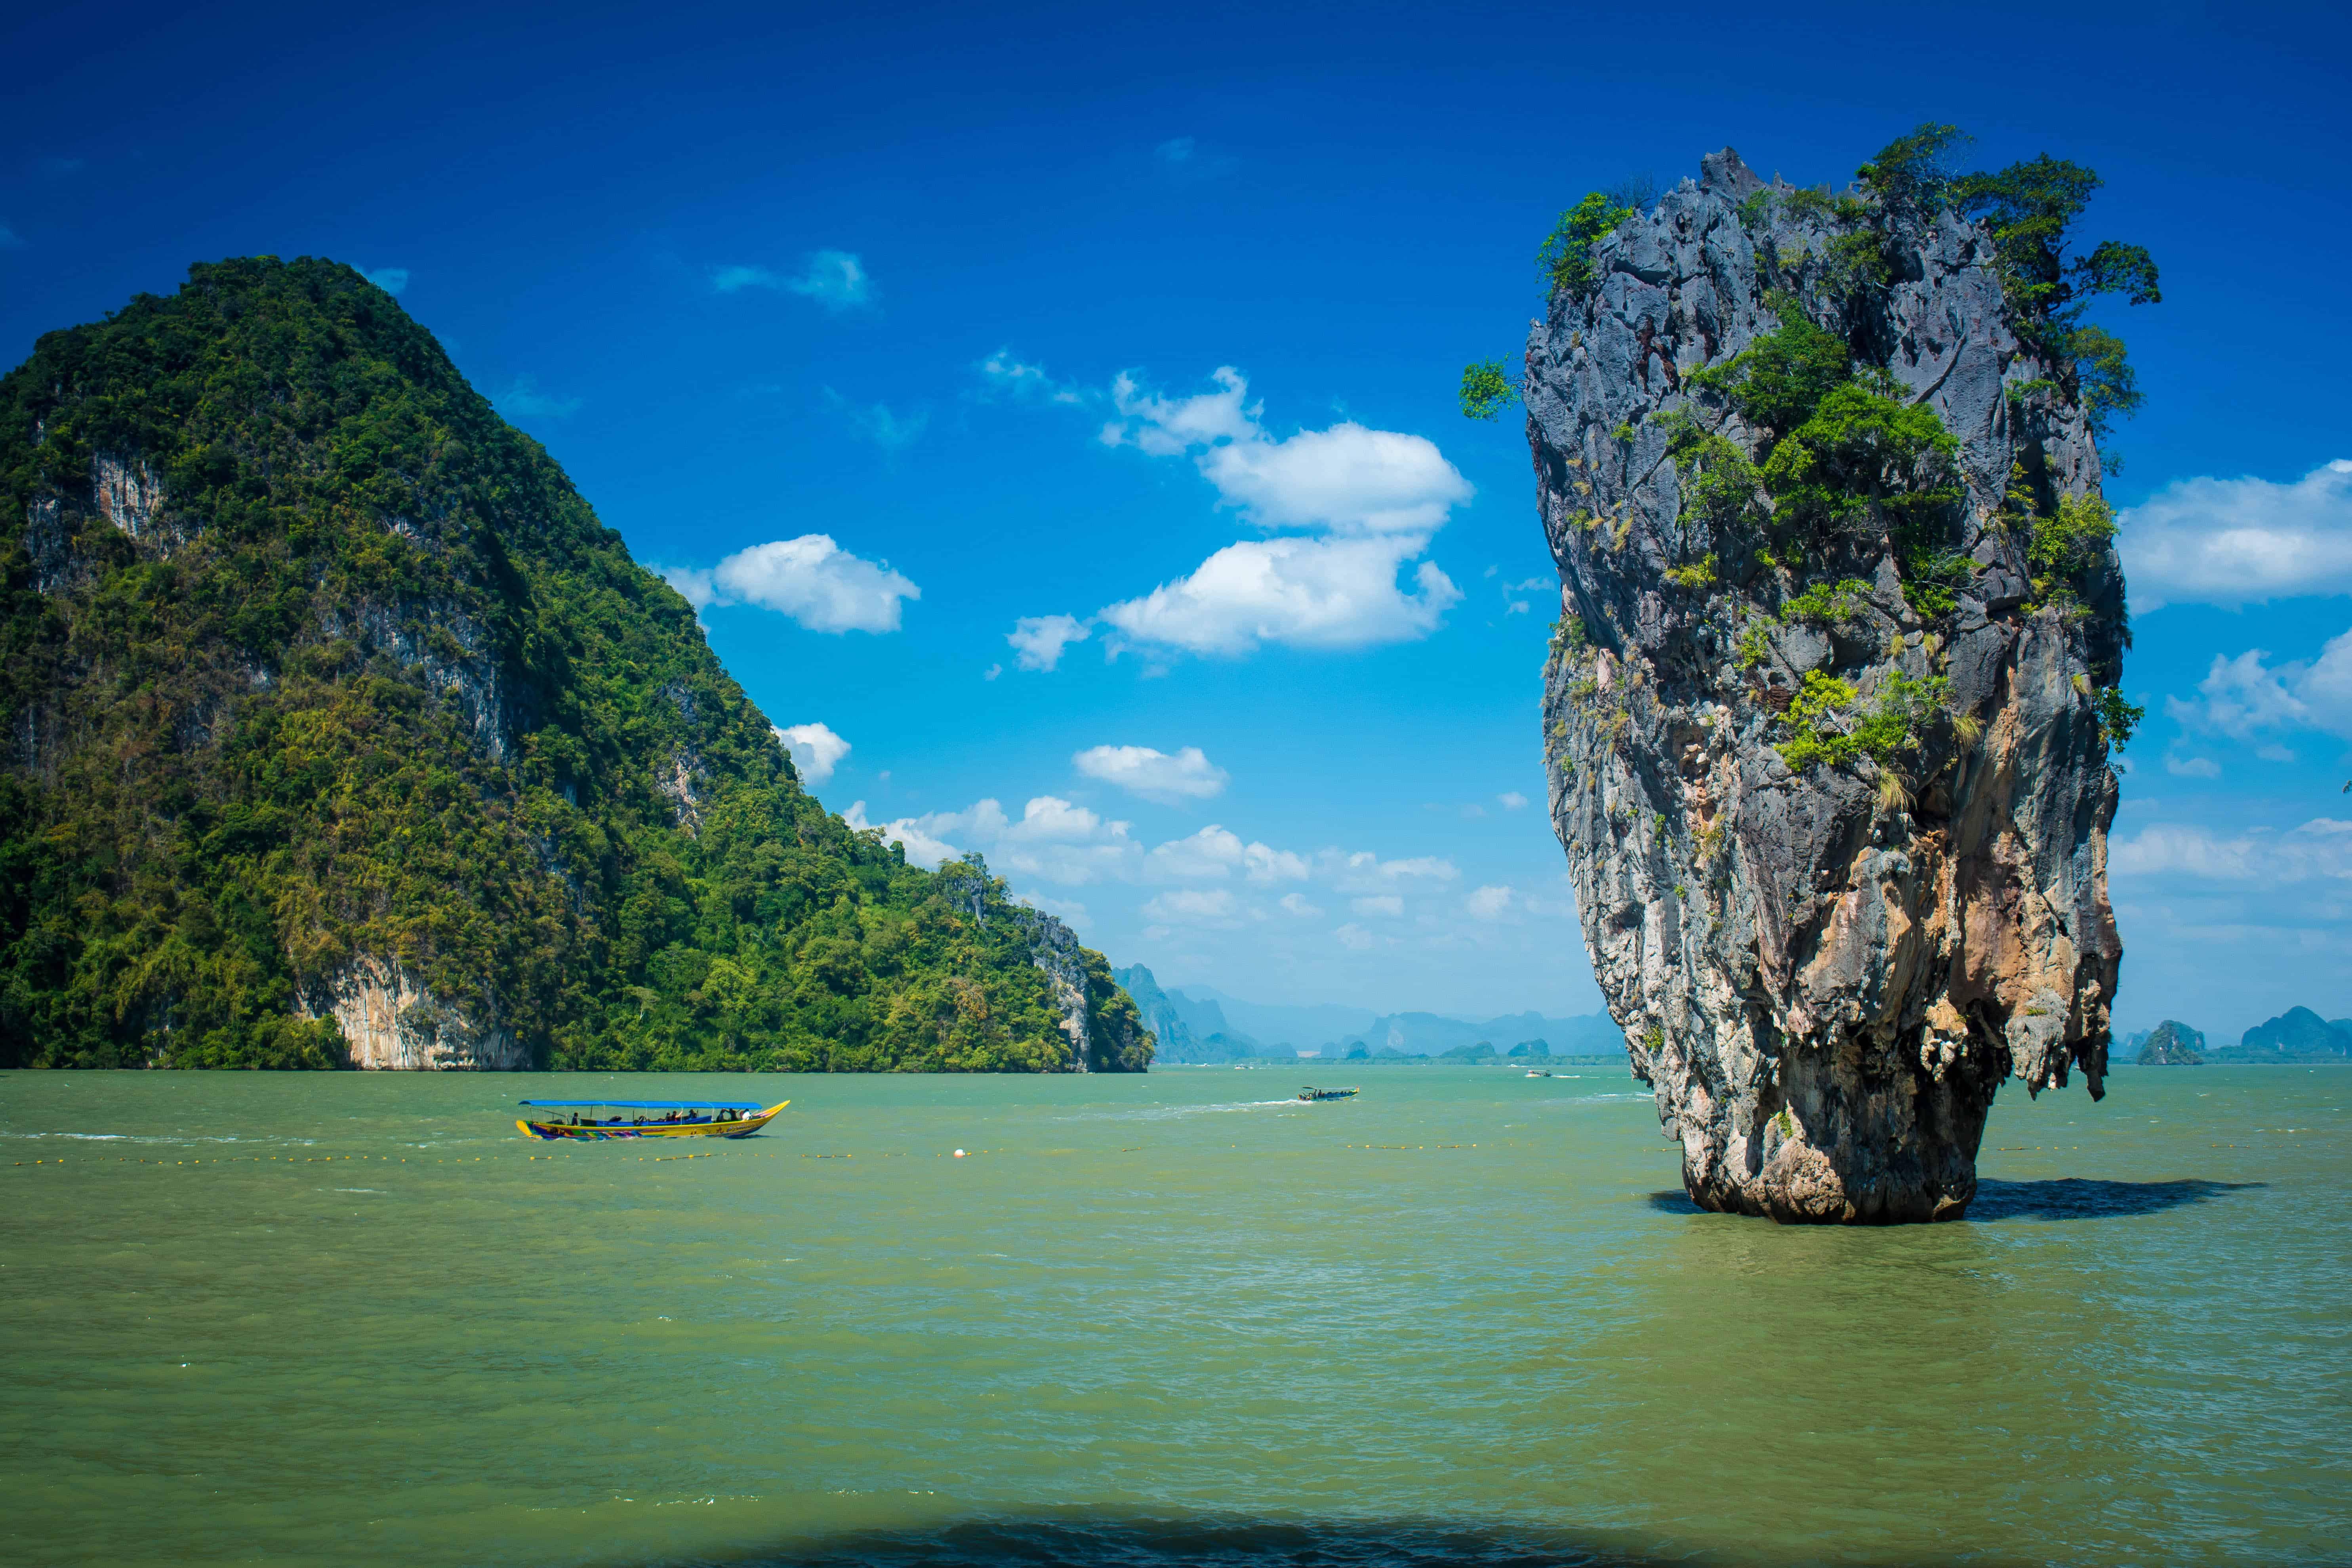 Phan Gna Bay to see where the James Bond movie was filmed